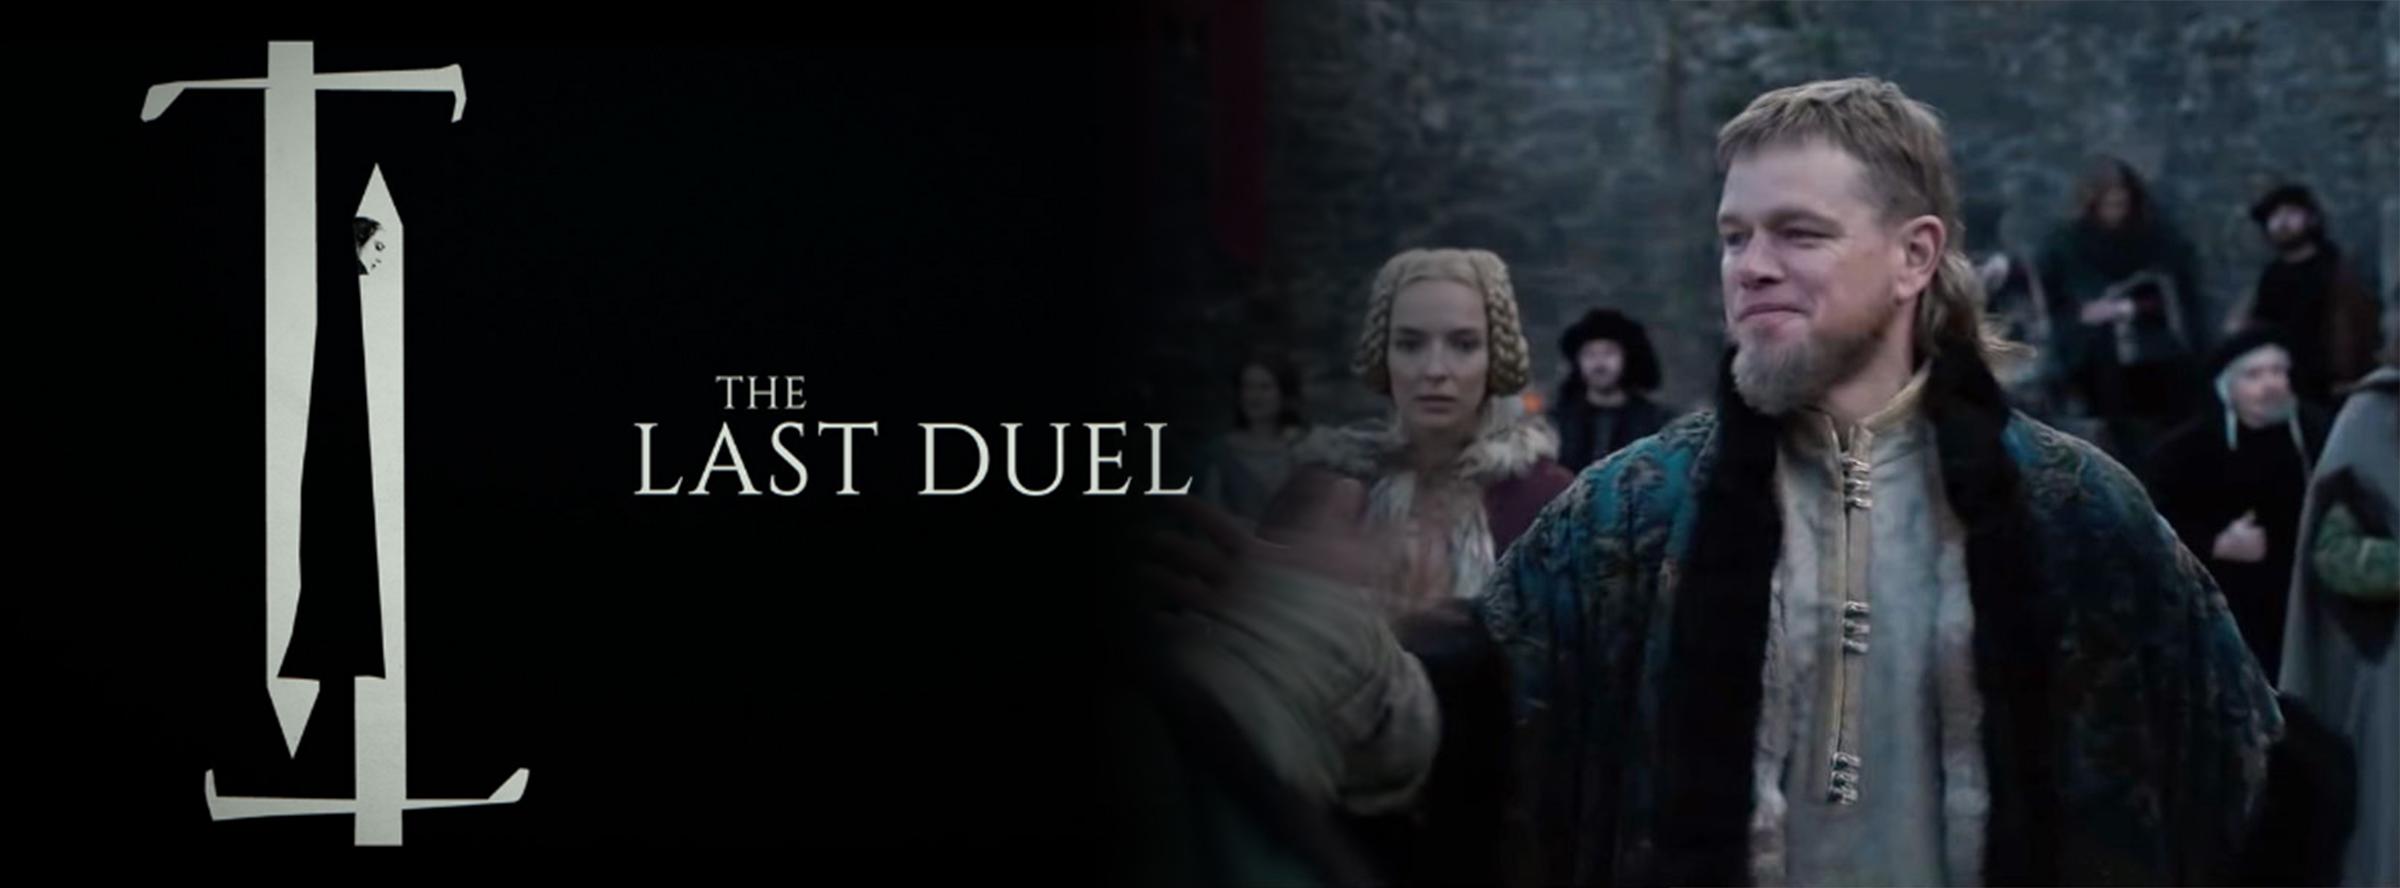 Slider Image for Last Duel, The